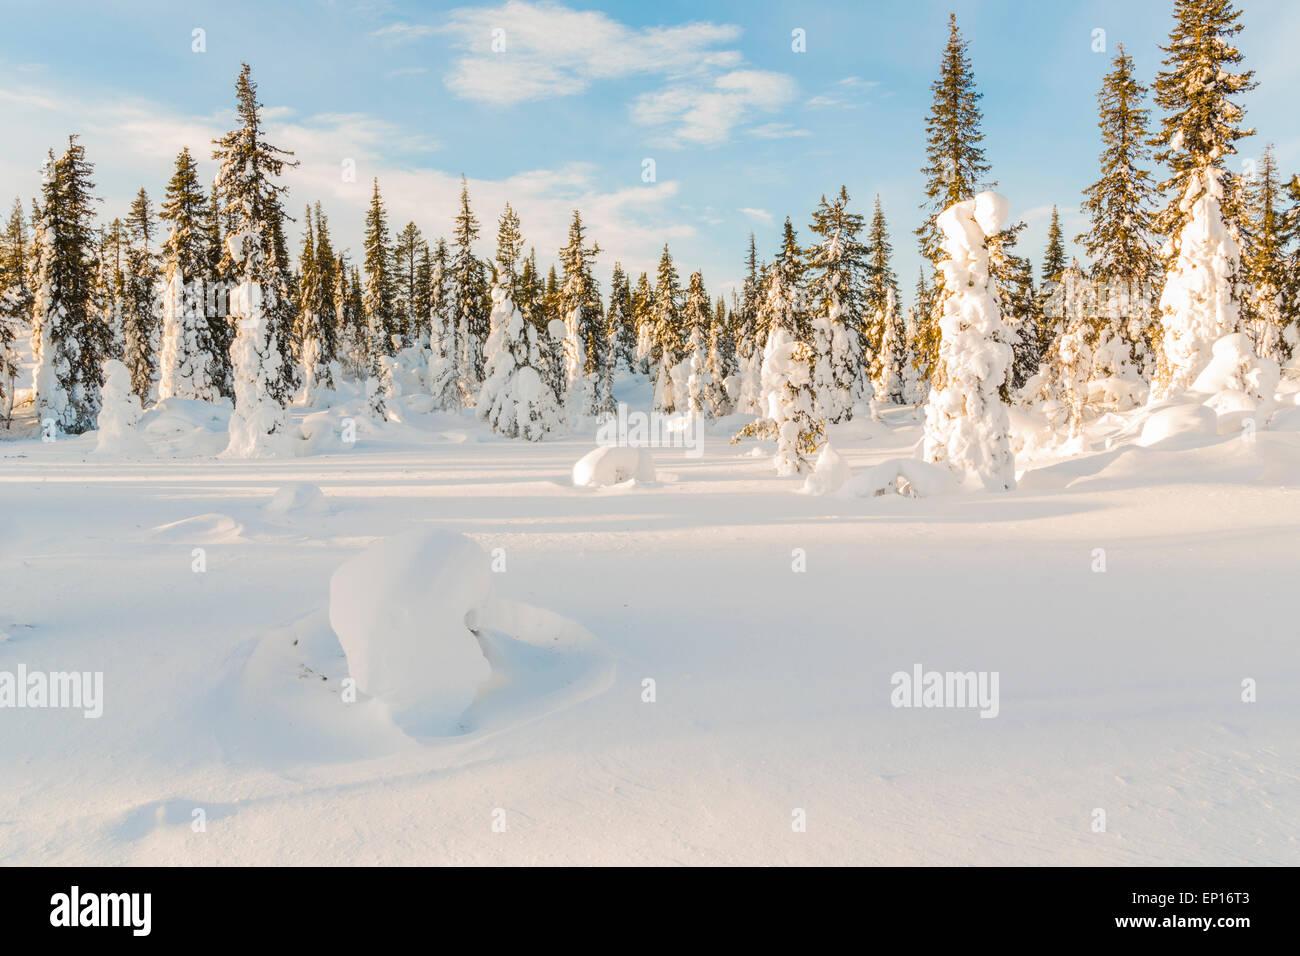 Snowy spruces and blue sky, Gällivare, Swedish lapland, Sweden - Stock Image